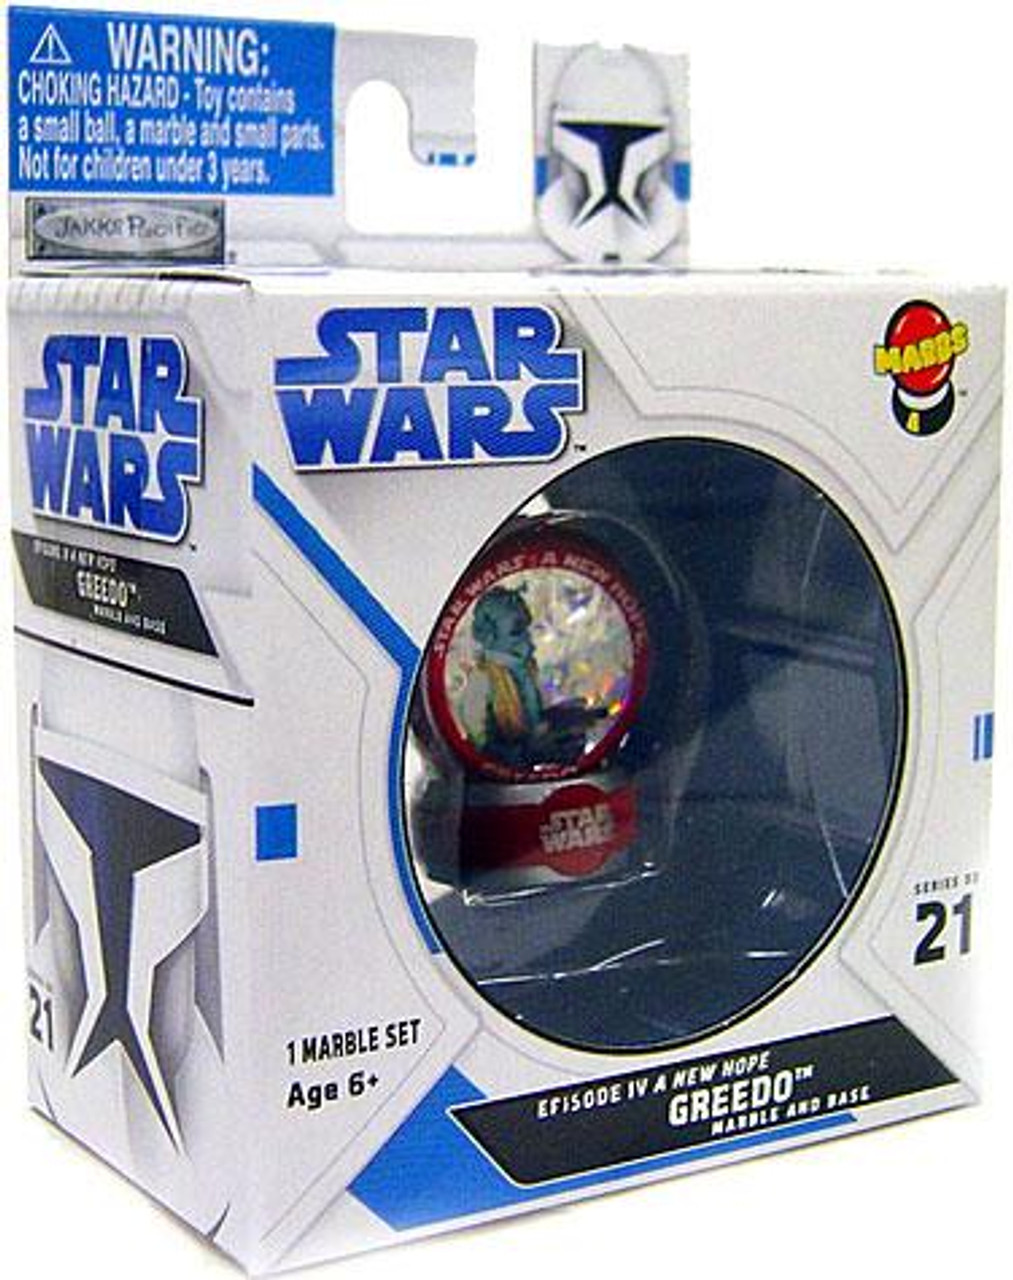 Star Wars A New Hope Marbs Series 2 Greedo Marble #21